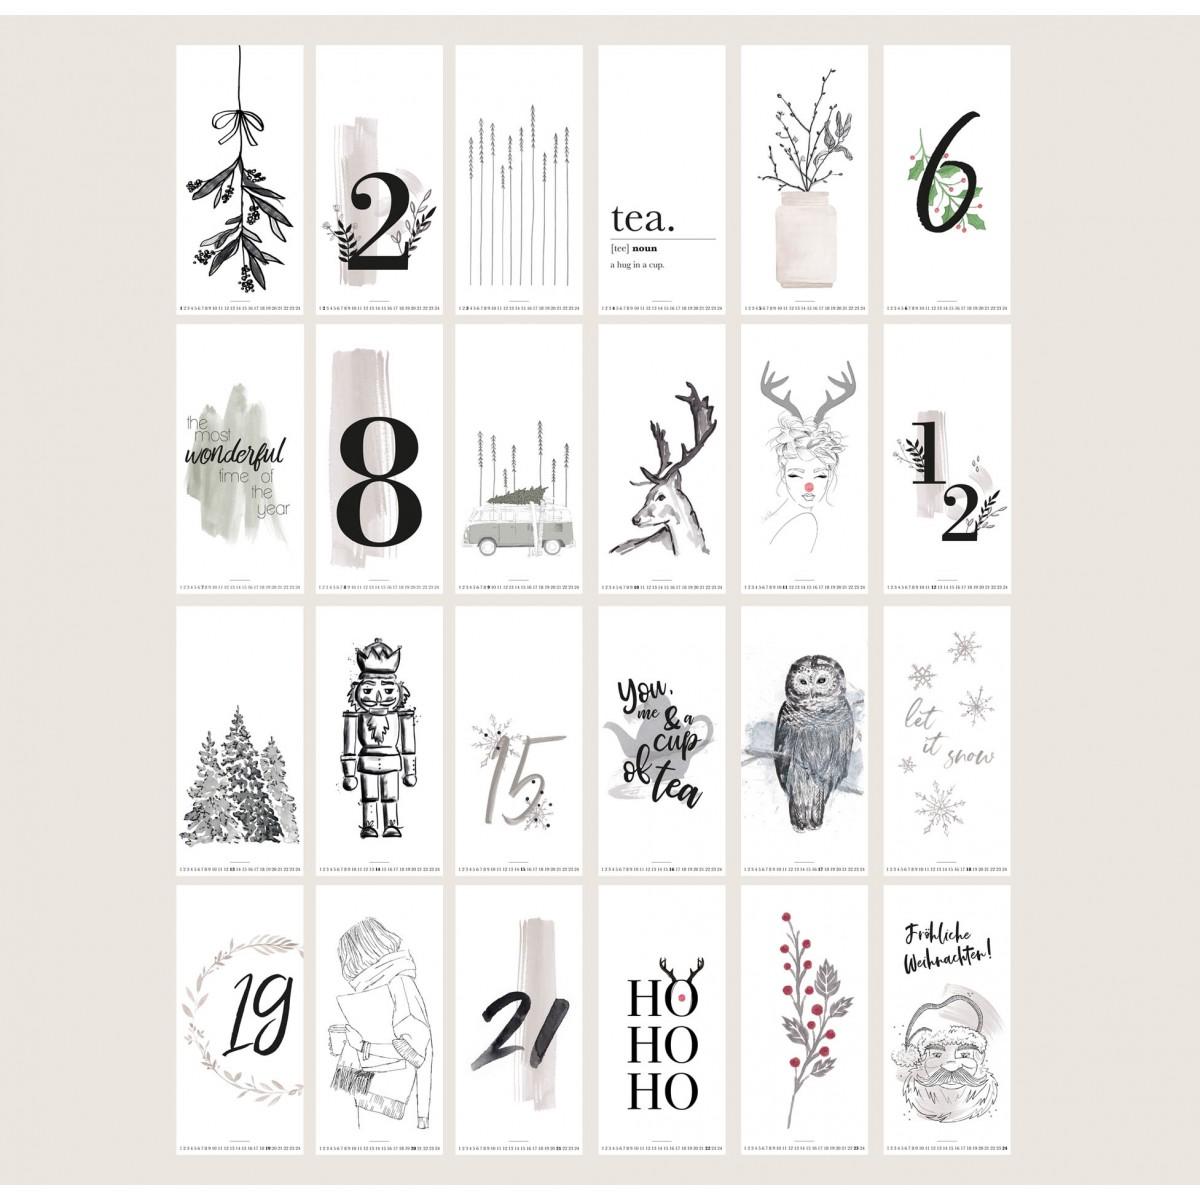 Kruth Design / ADVENTSKALENDER ART